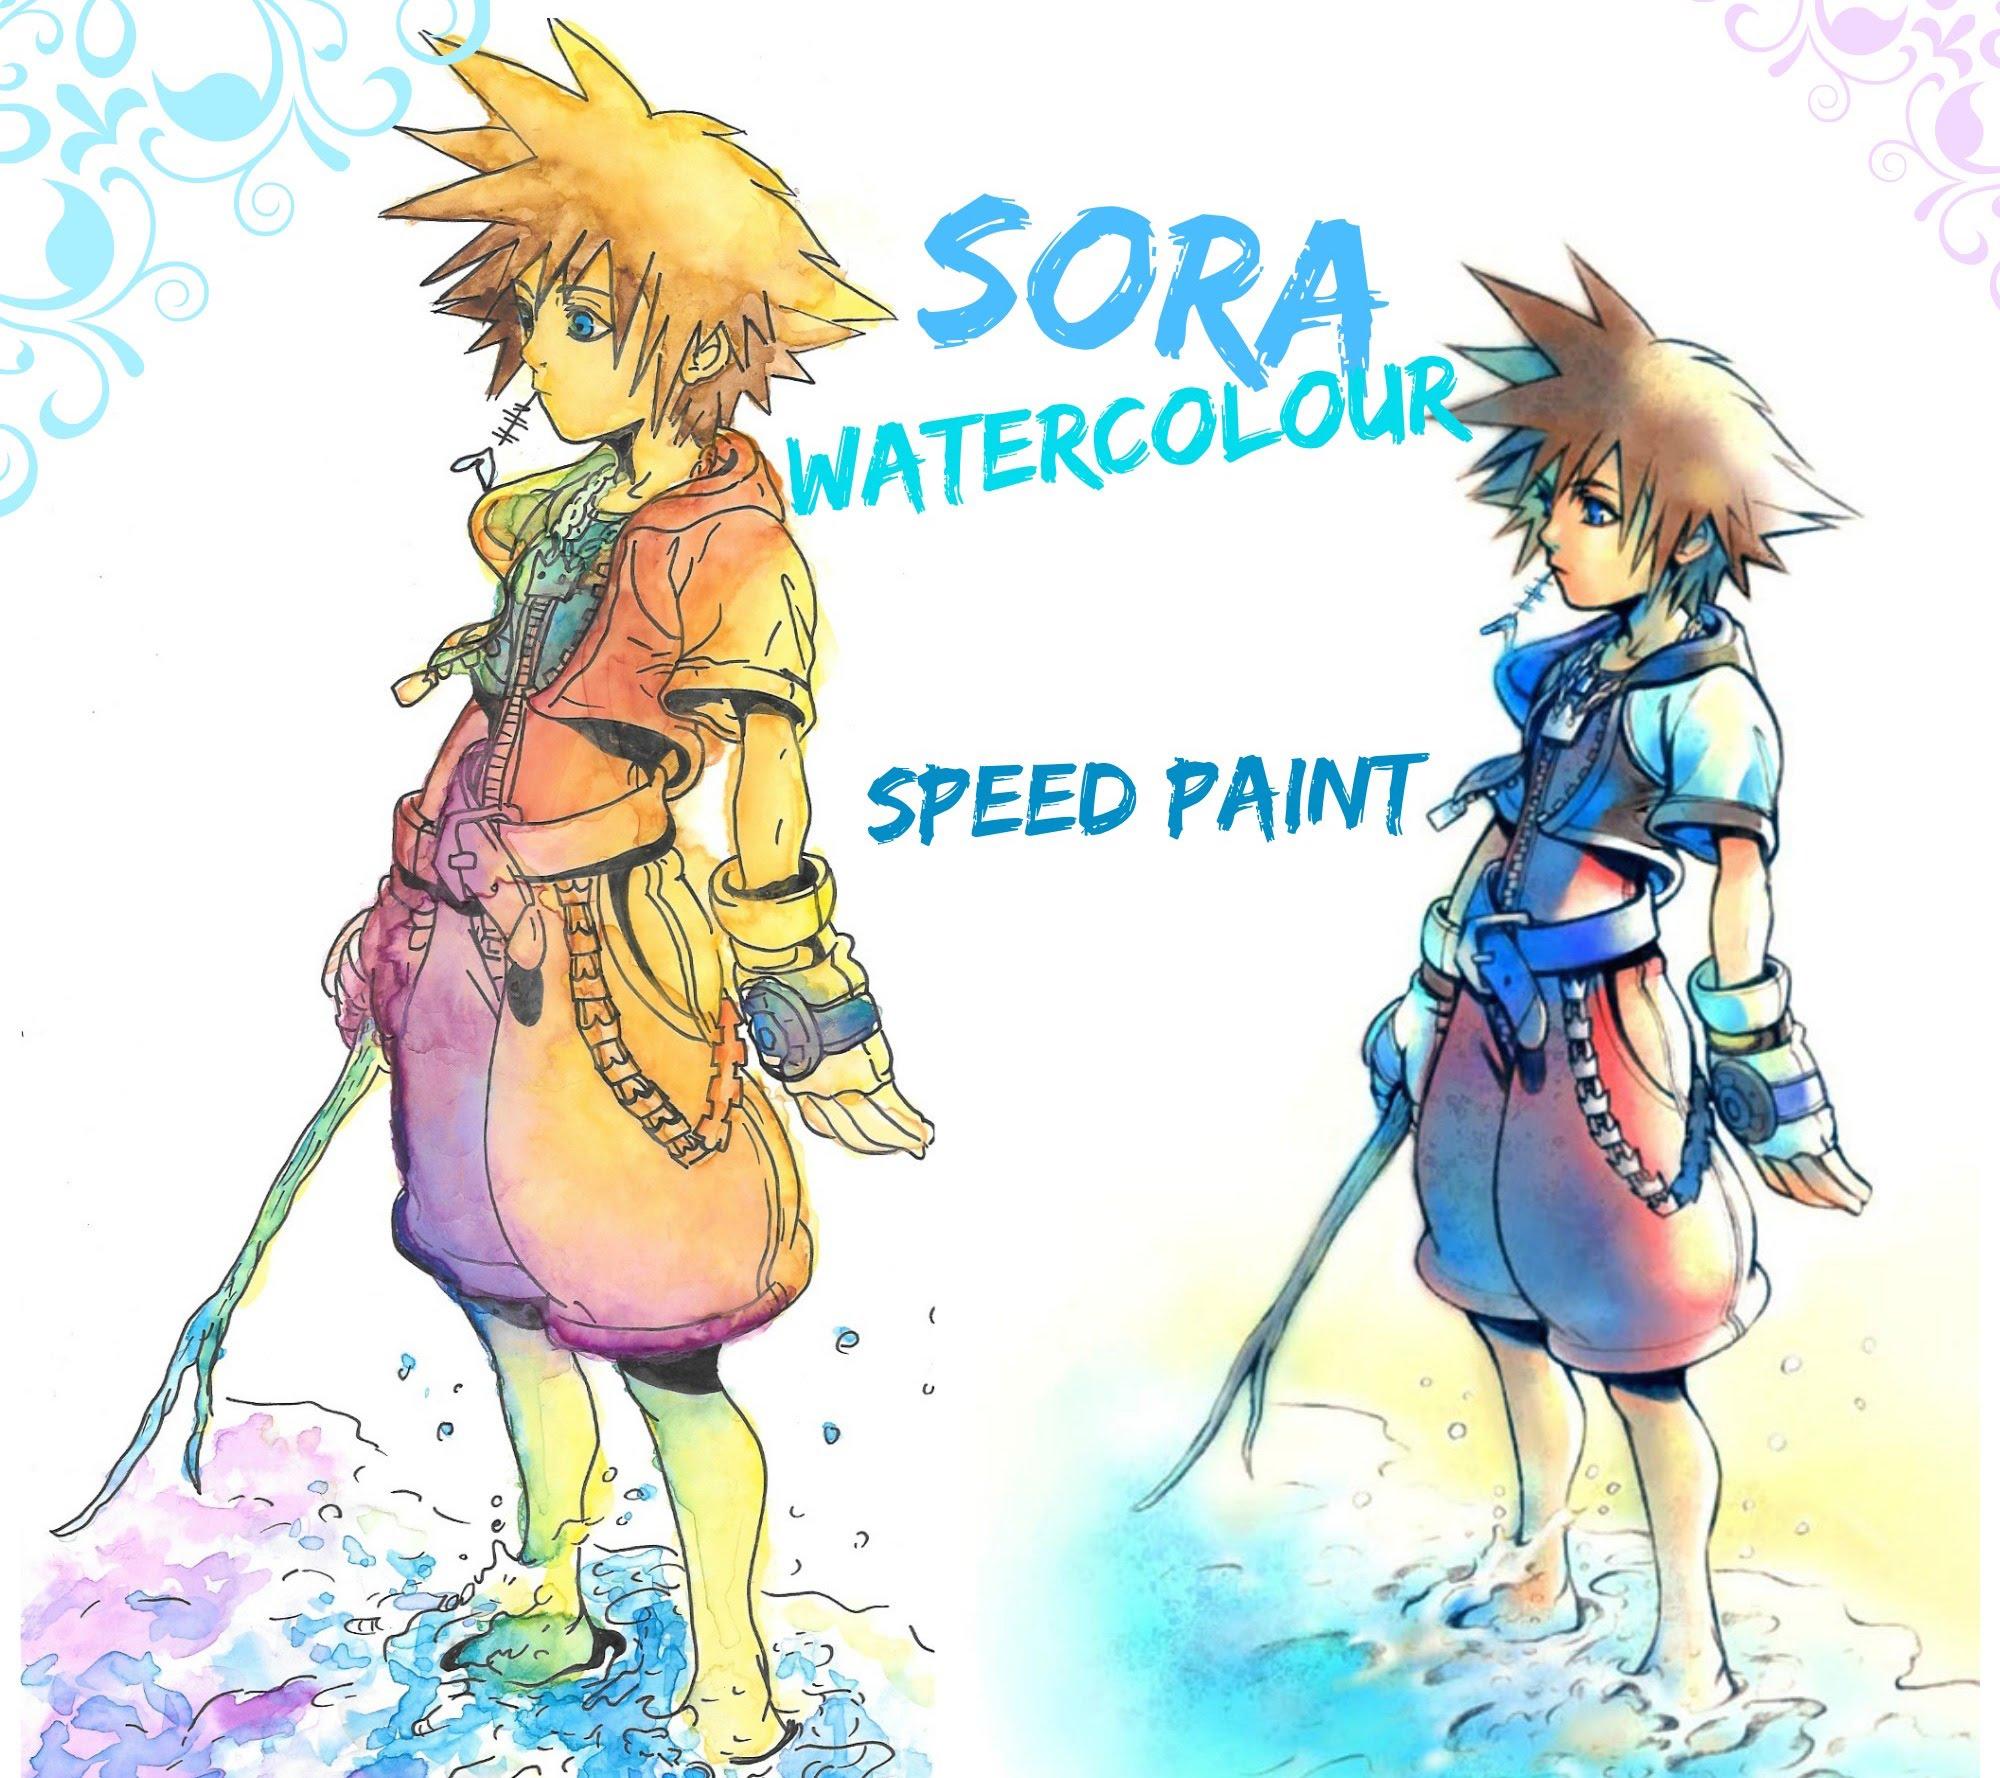 2000x1778 Watercolour Speed Paint Fanart Sora From Kingdom Hearts